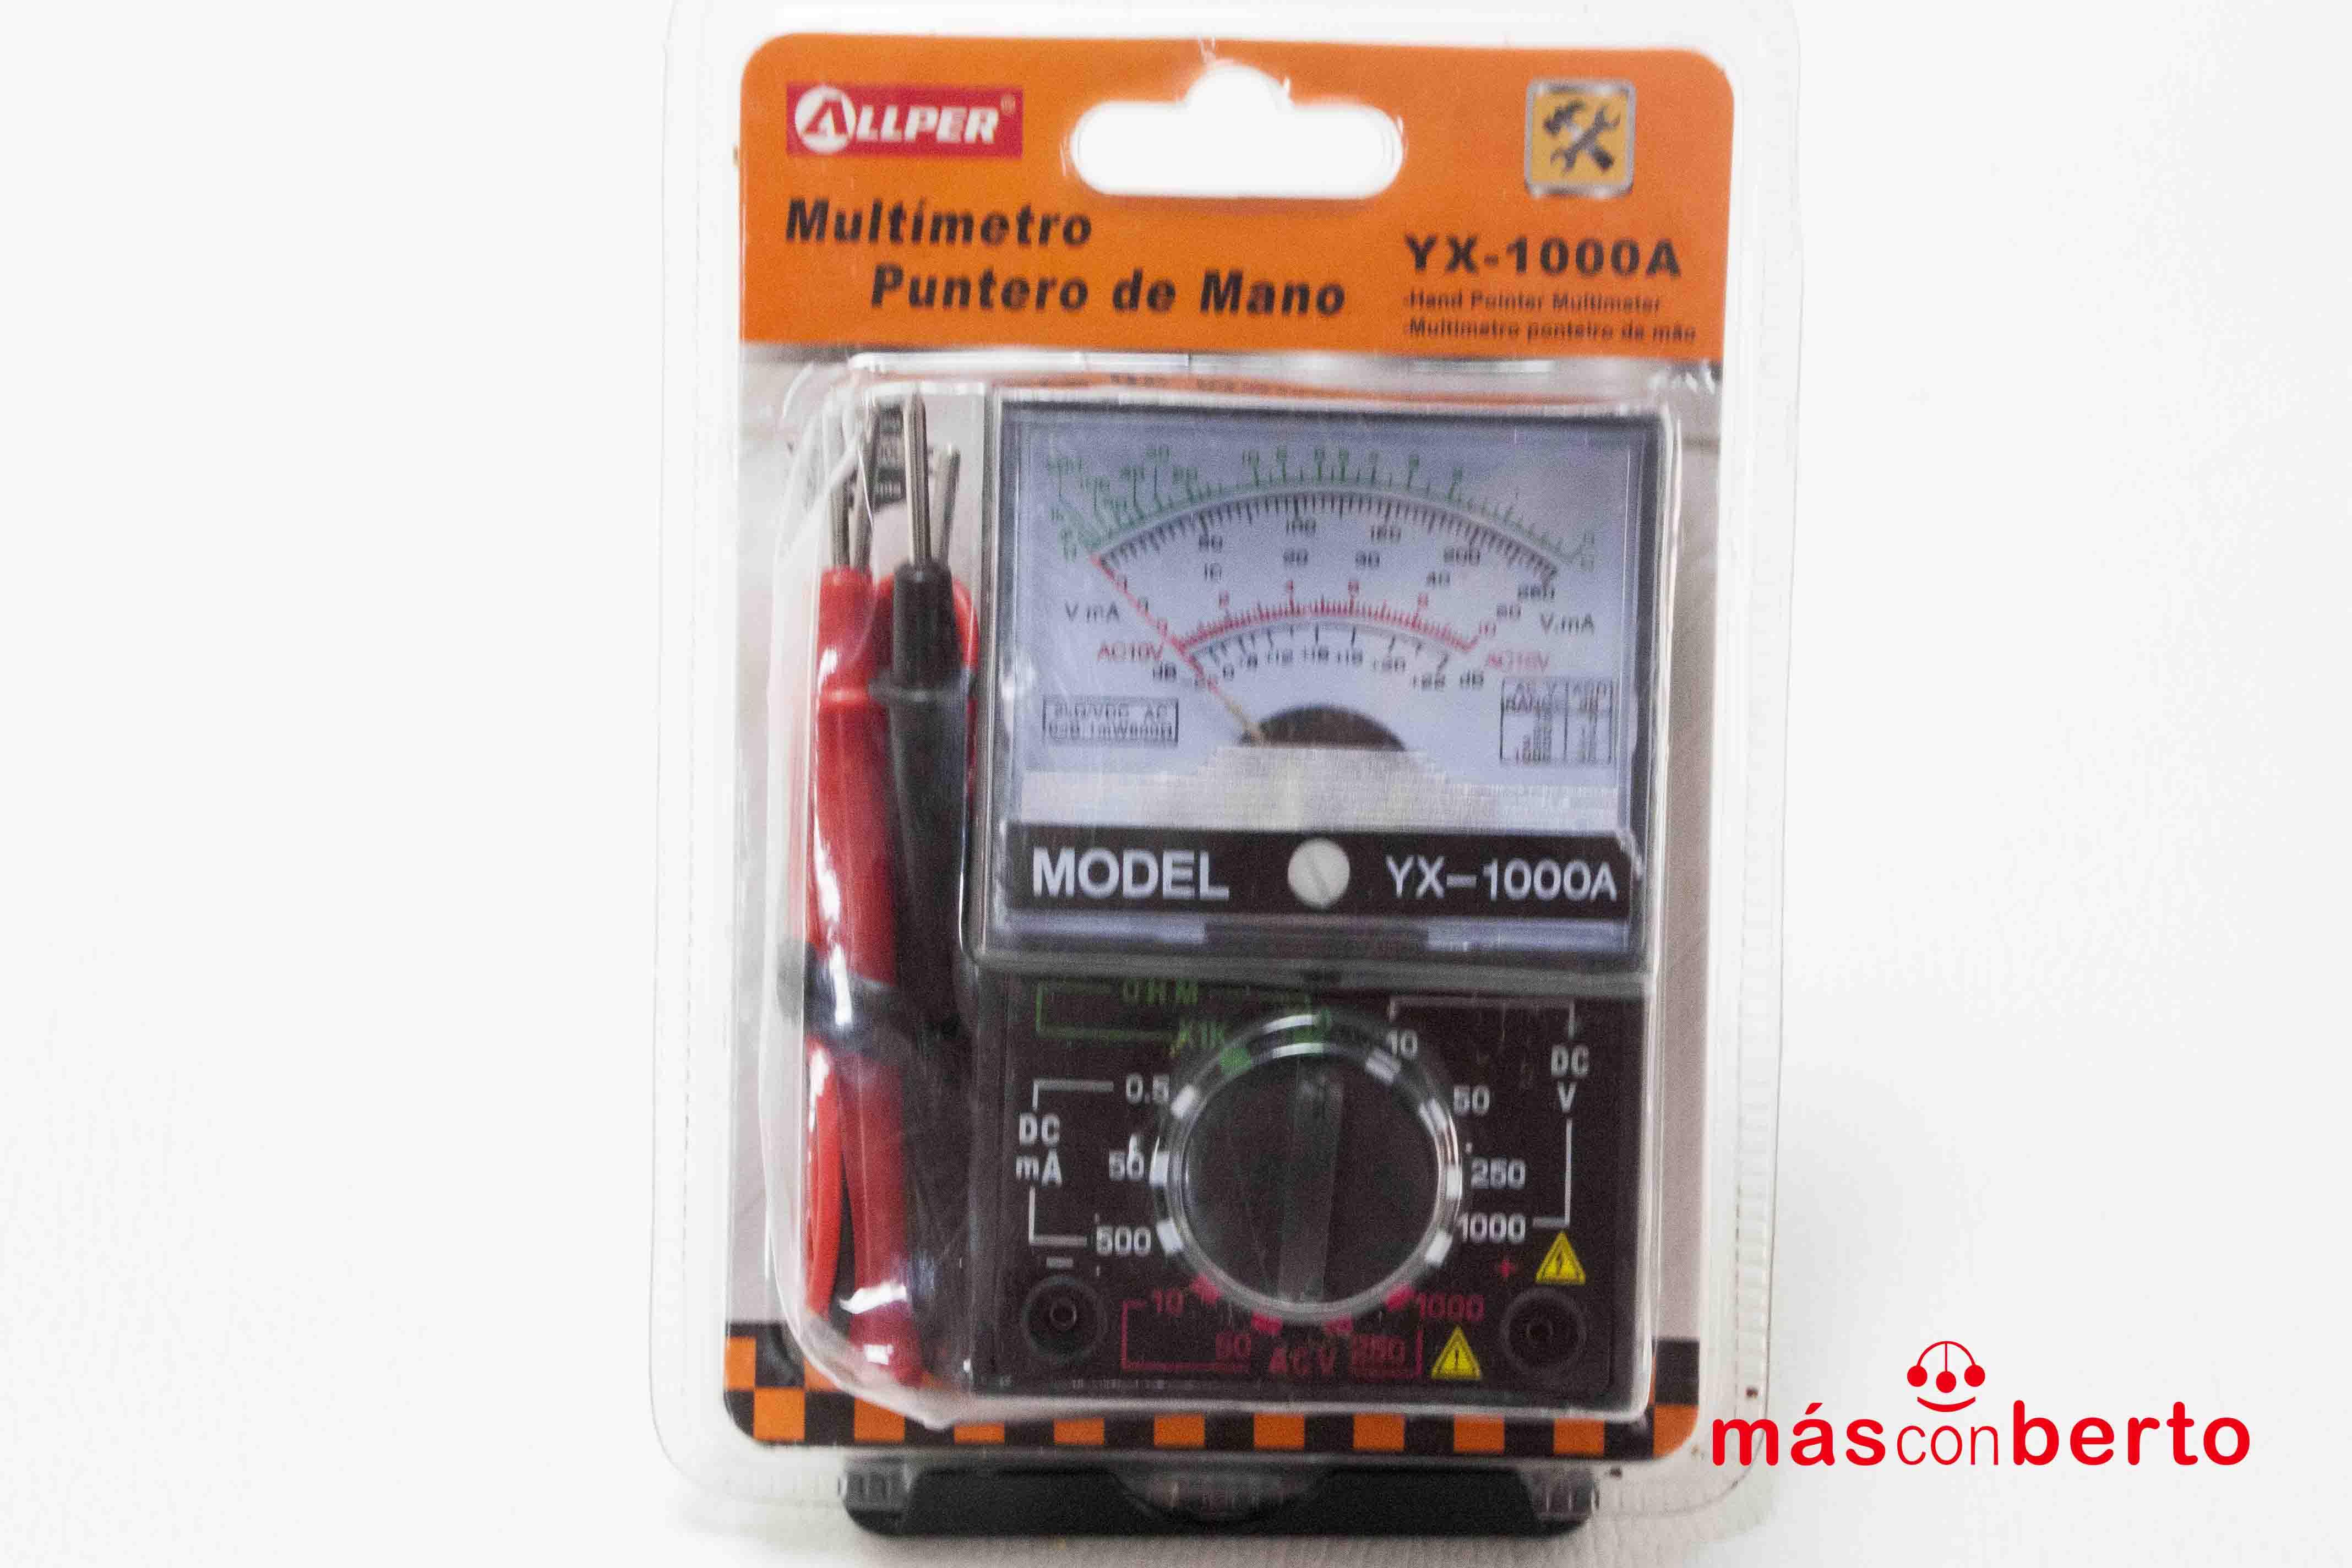 Multímetro Allper YX-1000A